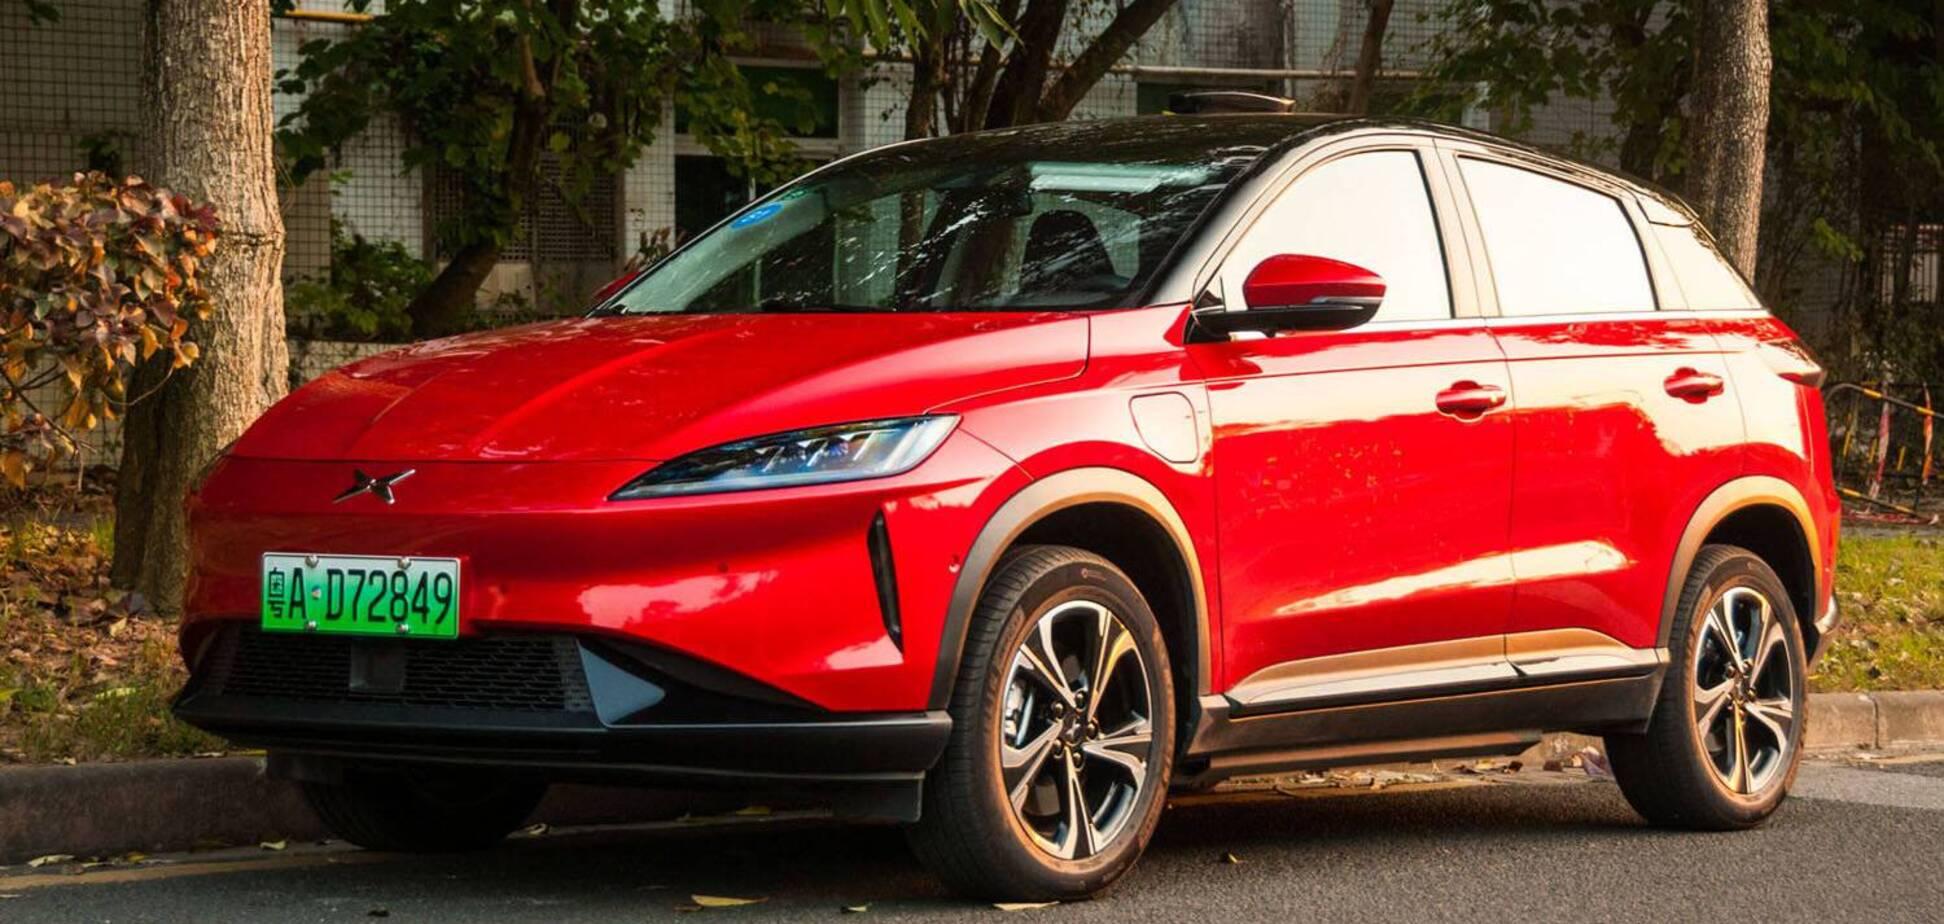 Компания Xpeng Motors расширяется за счет масштабных инвестиций. Фото: Xpeng Motors